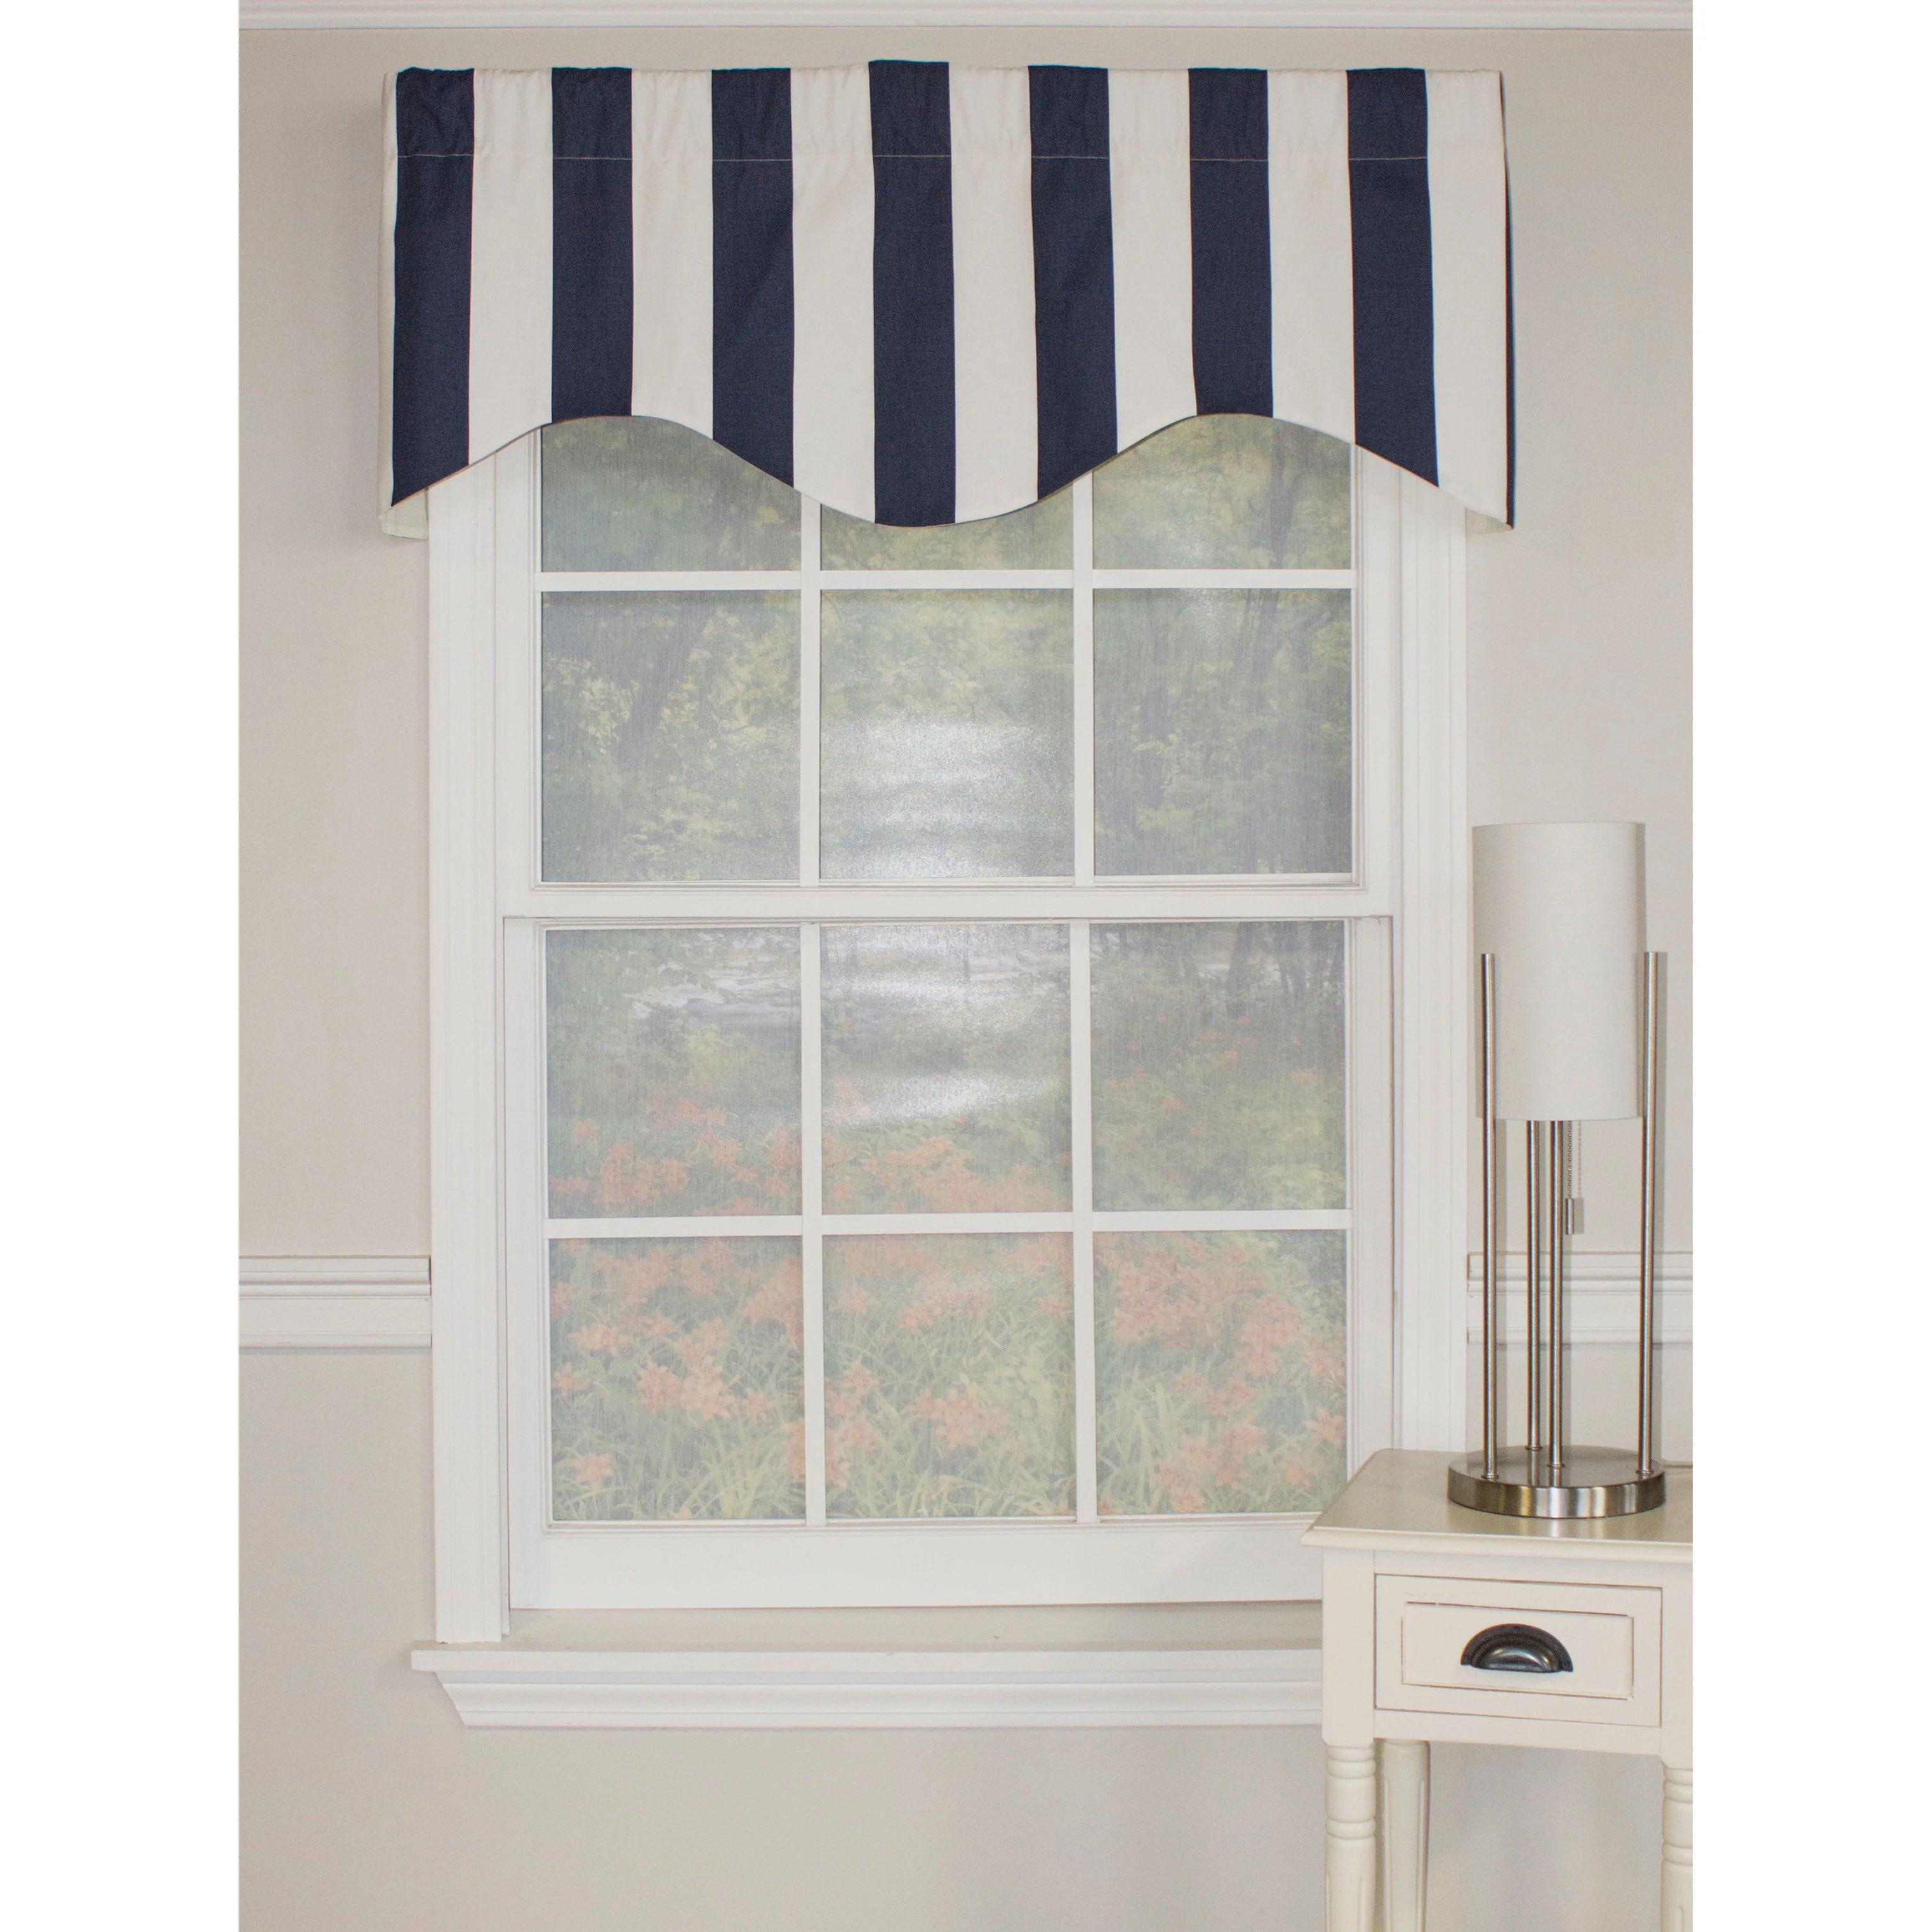 Striped Valances & Kitchen Curtains You'll Love Wayfair